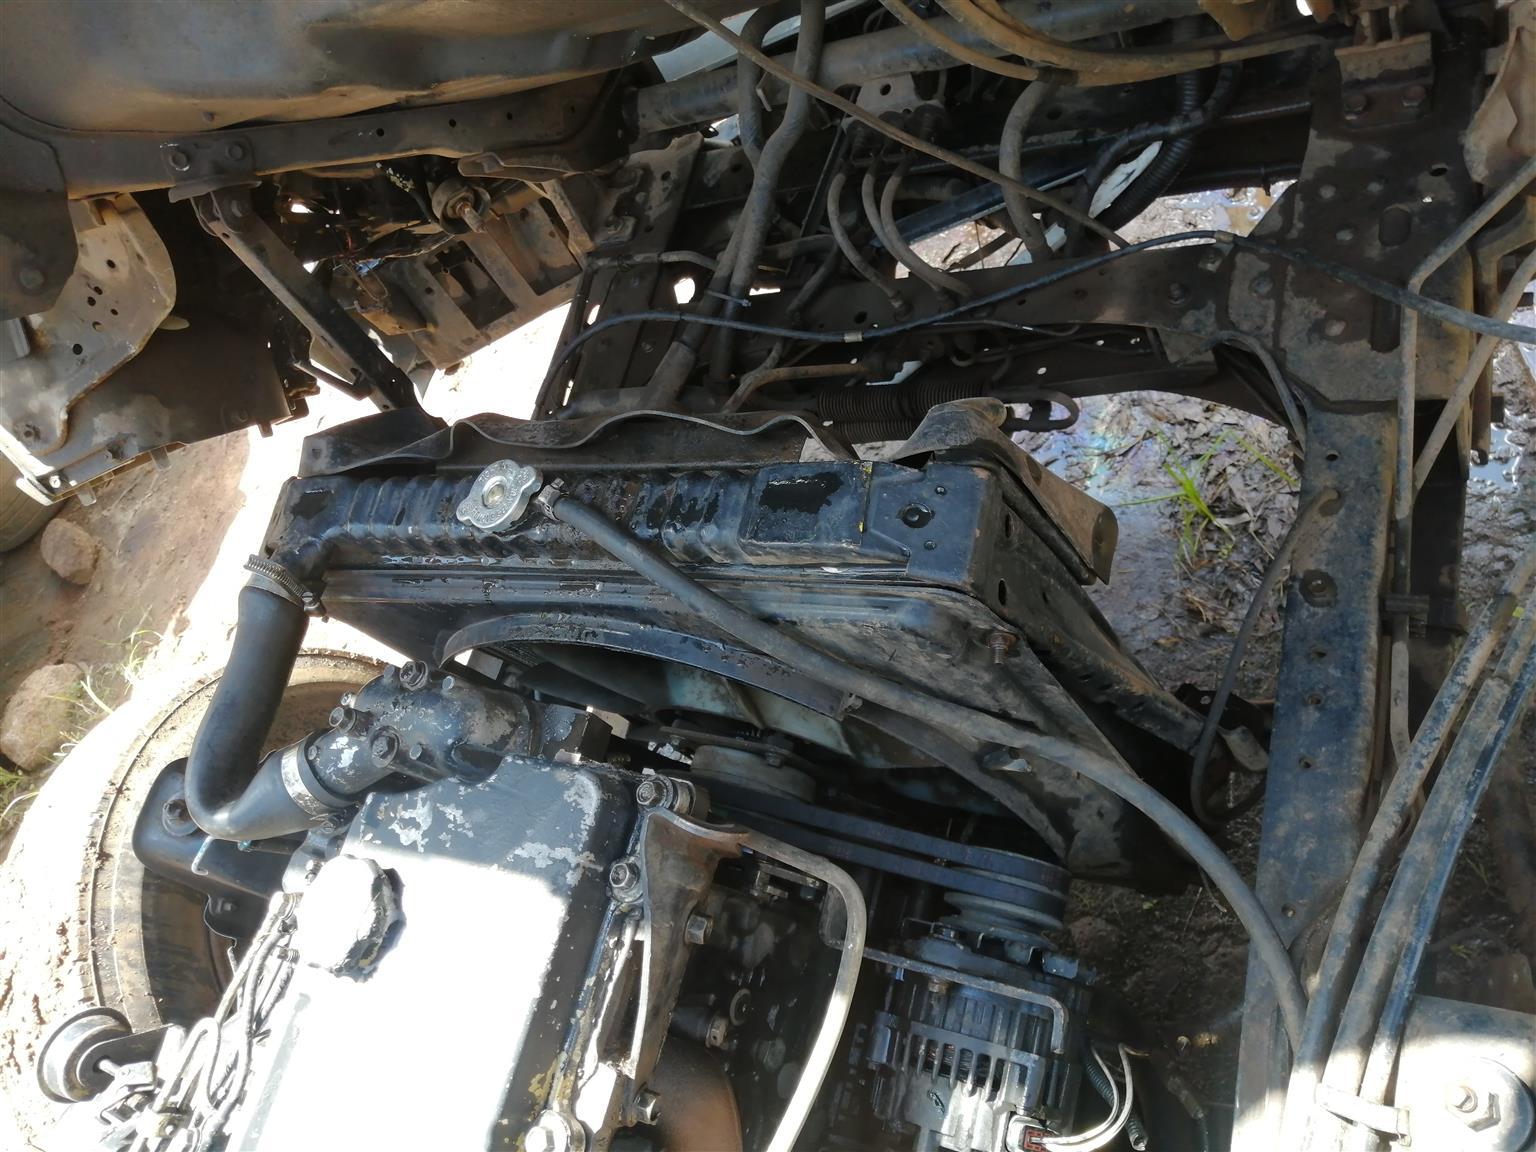 Selling isuzu npr 500 turbo engine 4he1